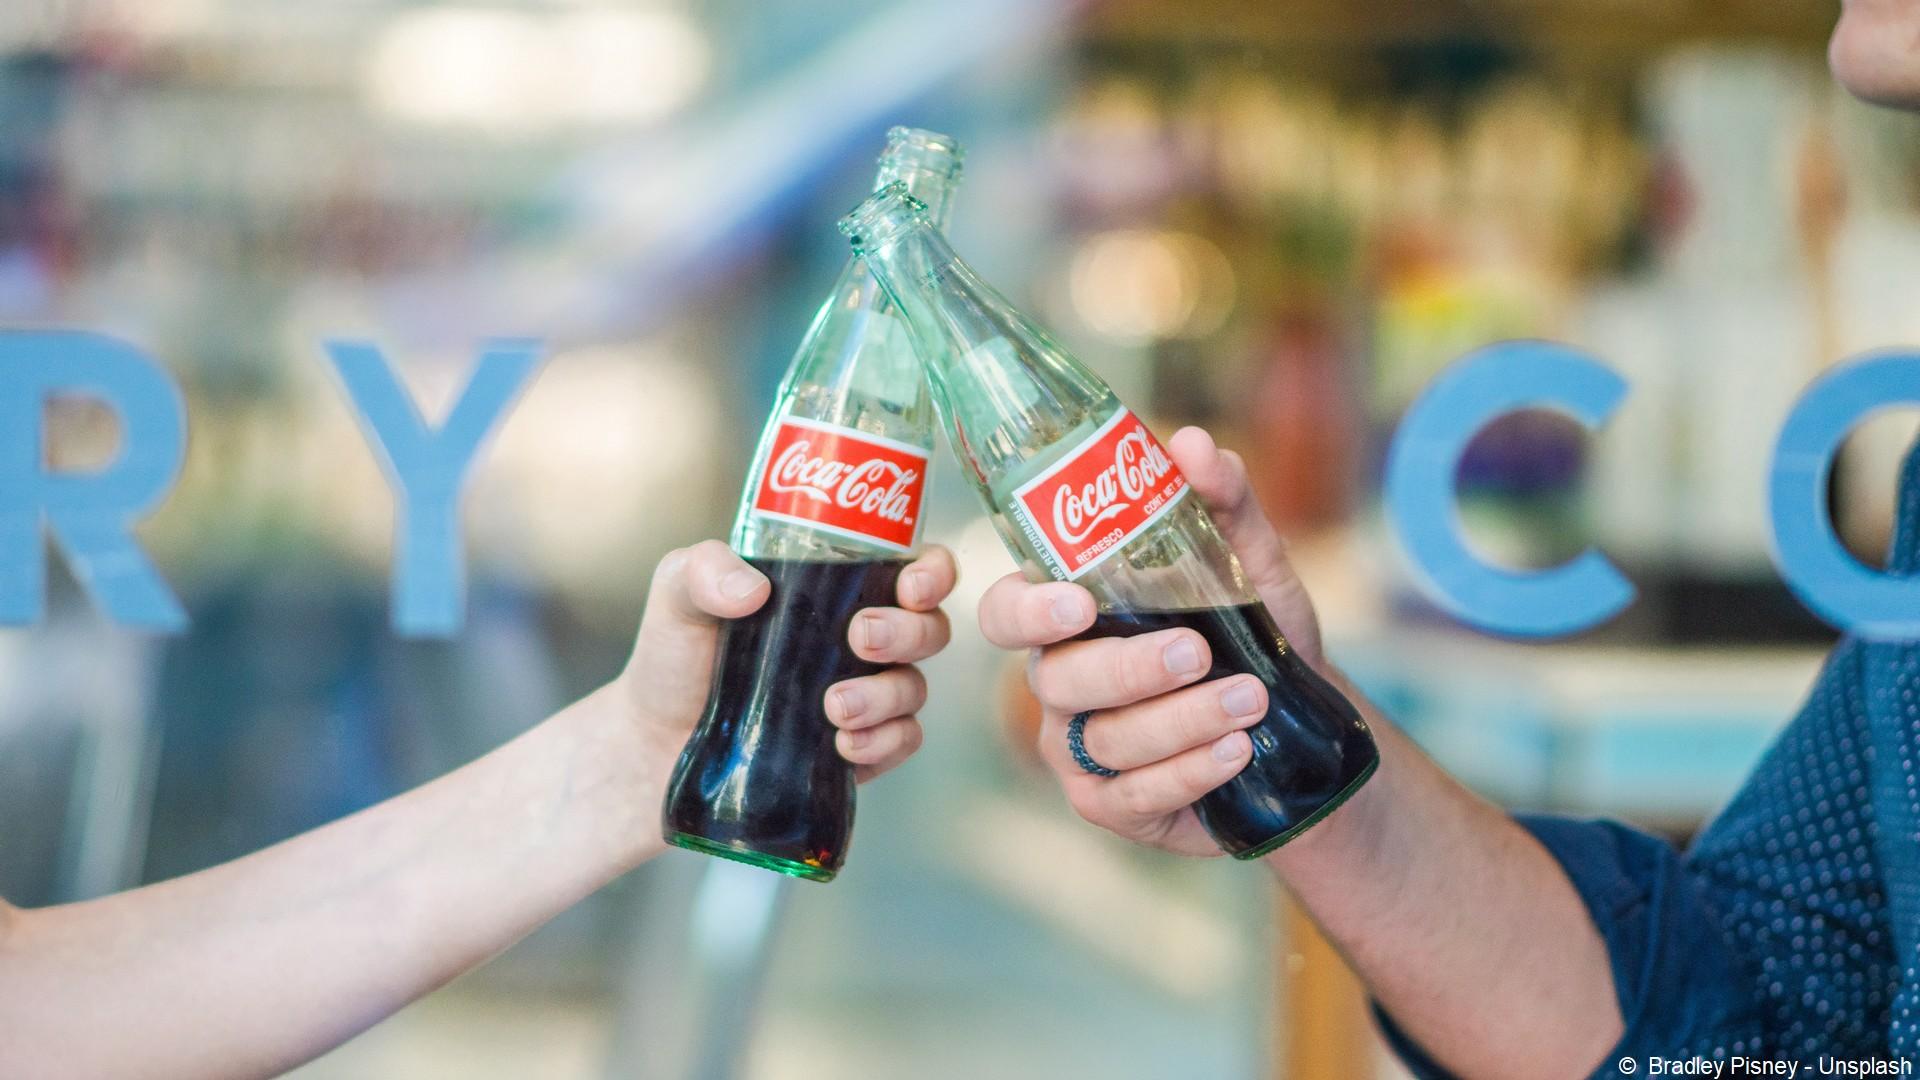 Coca-Cola (logo) (c) Bradley Pisney Unsplash